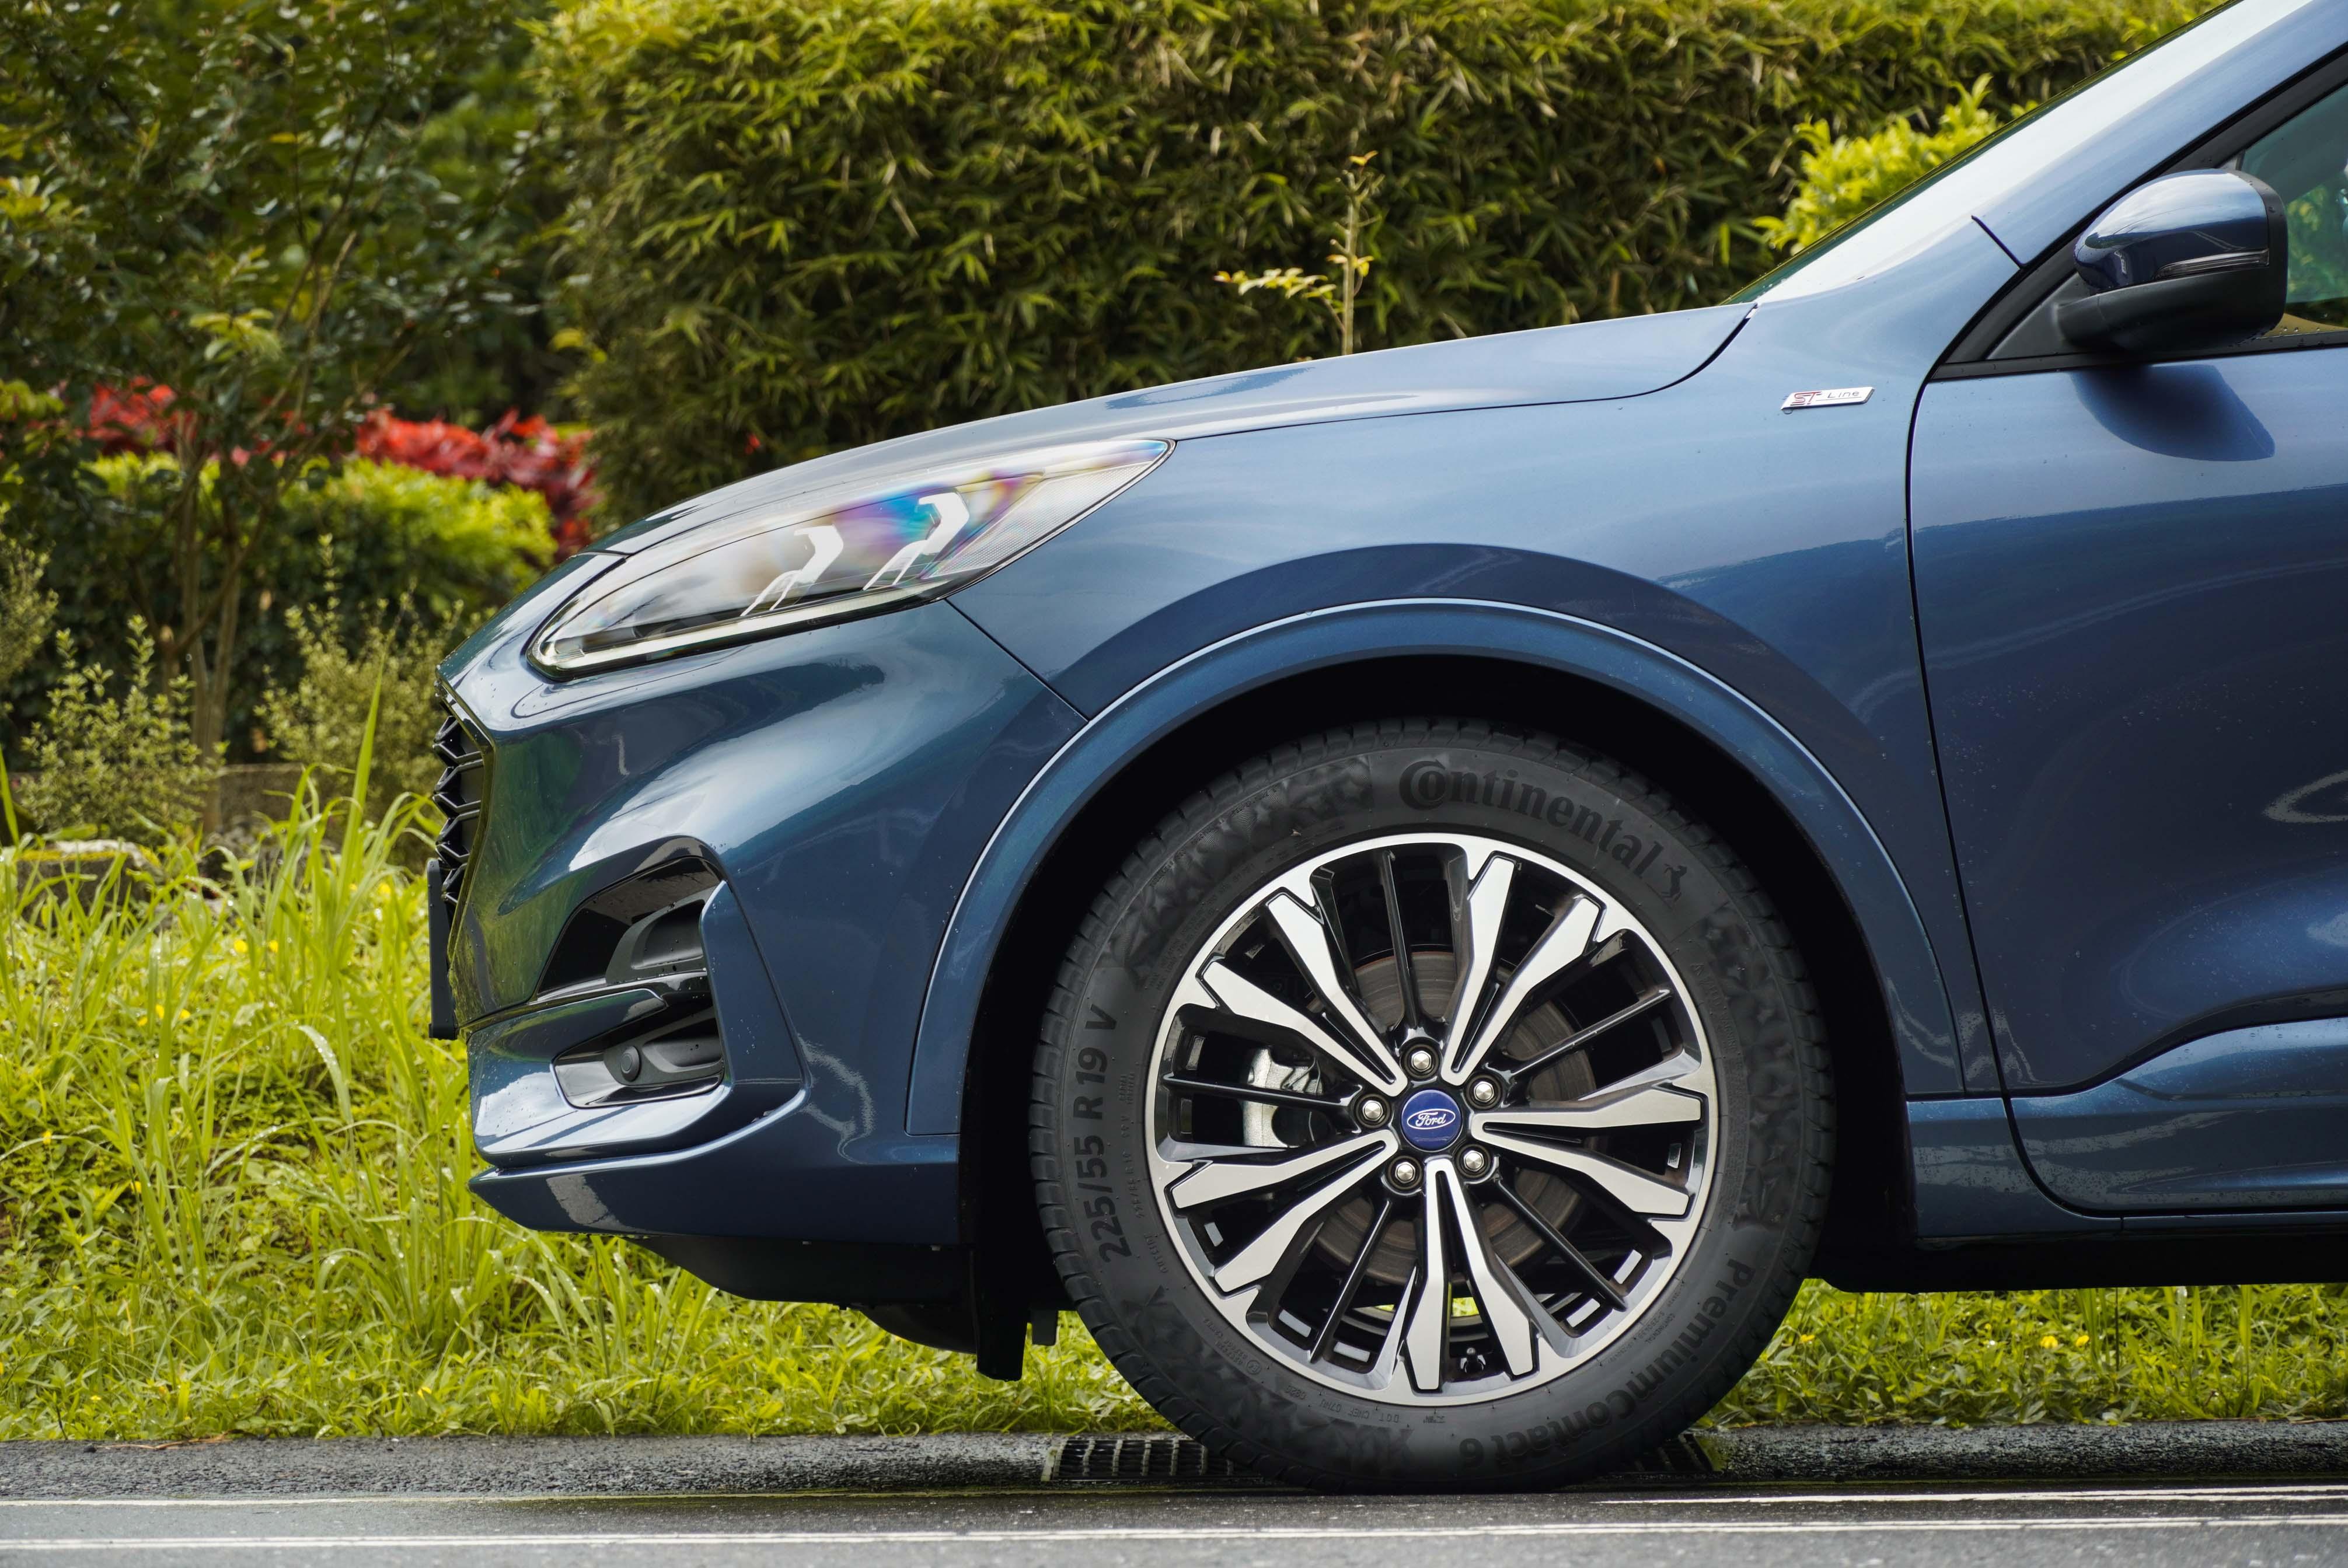 Kuga ST-Line 標配 19 吋輪圈搭配 Pirelli Scorpion Verde 輪胎,原廠提供 2 萬元優惠價換裝 Continental Premium Contact 6 輪胎。